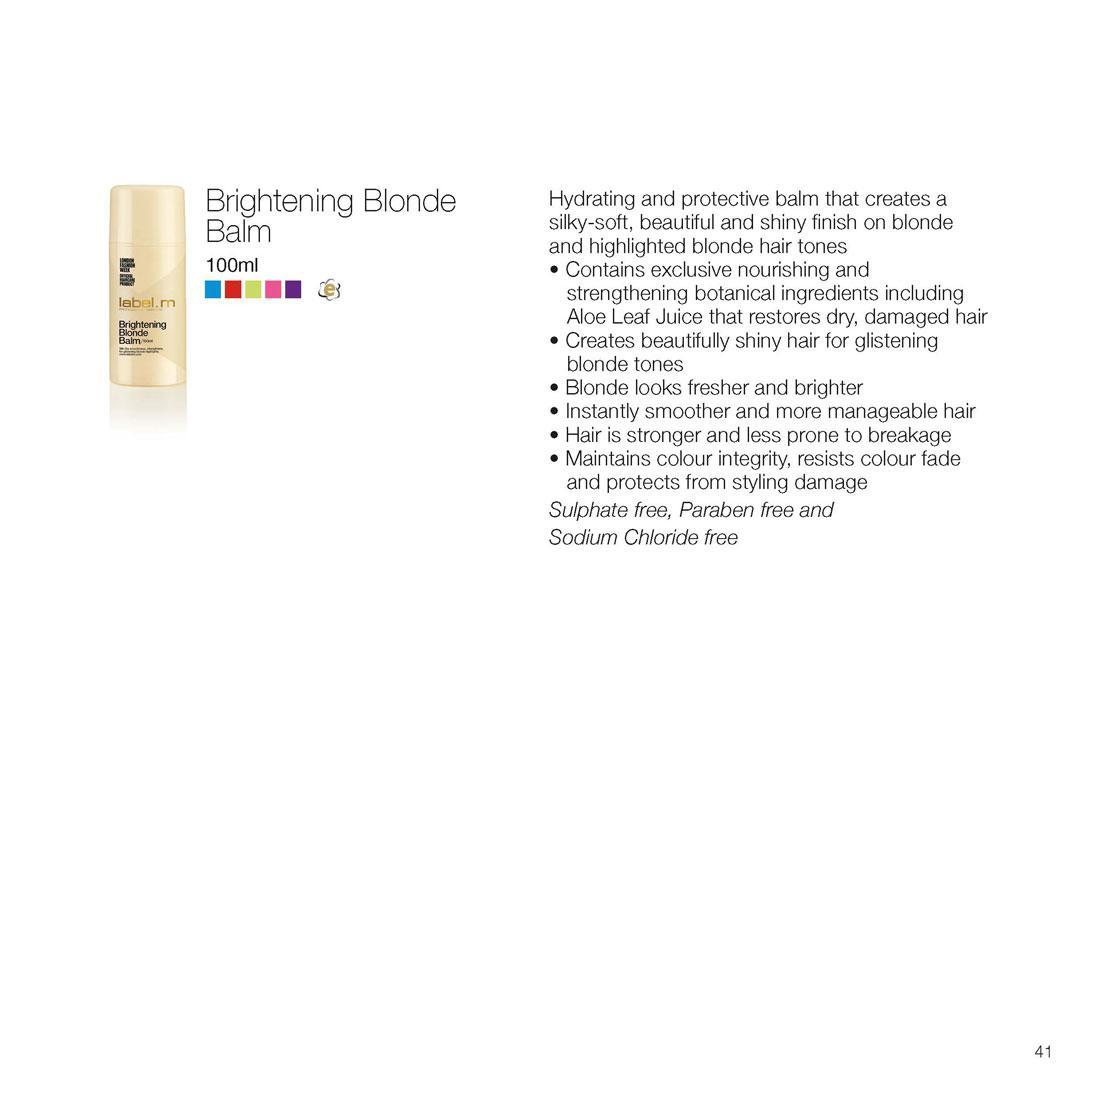 587.9-label-m-brightening-blonde-4-pg-41.jpg